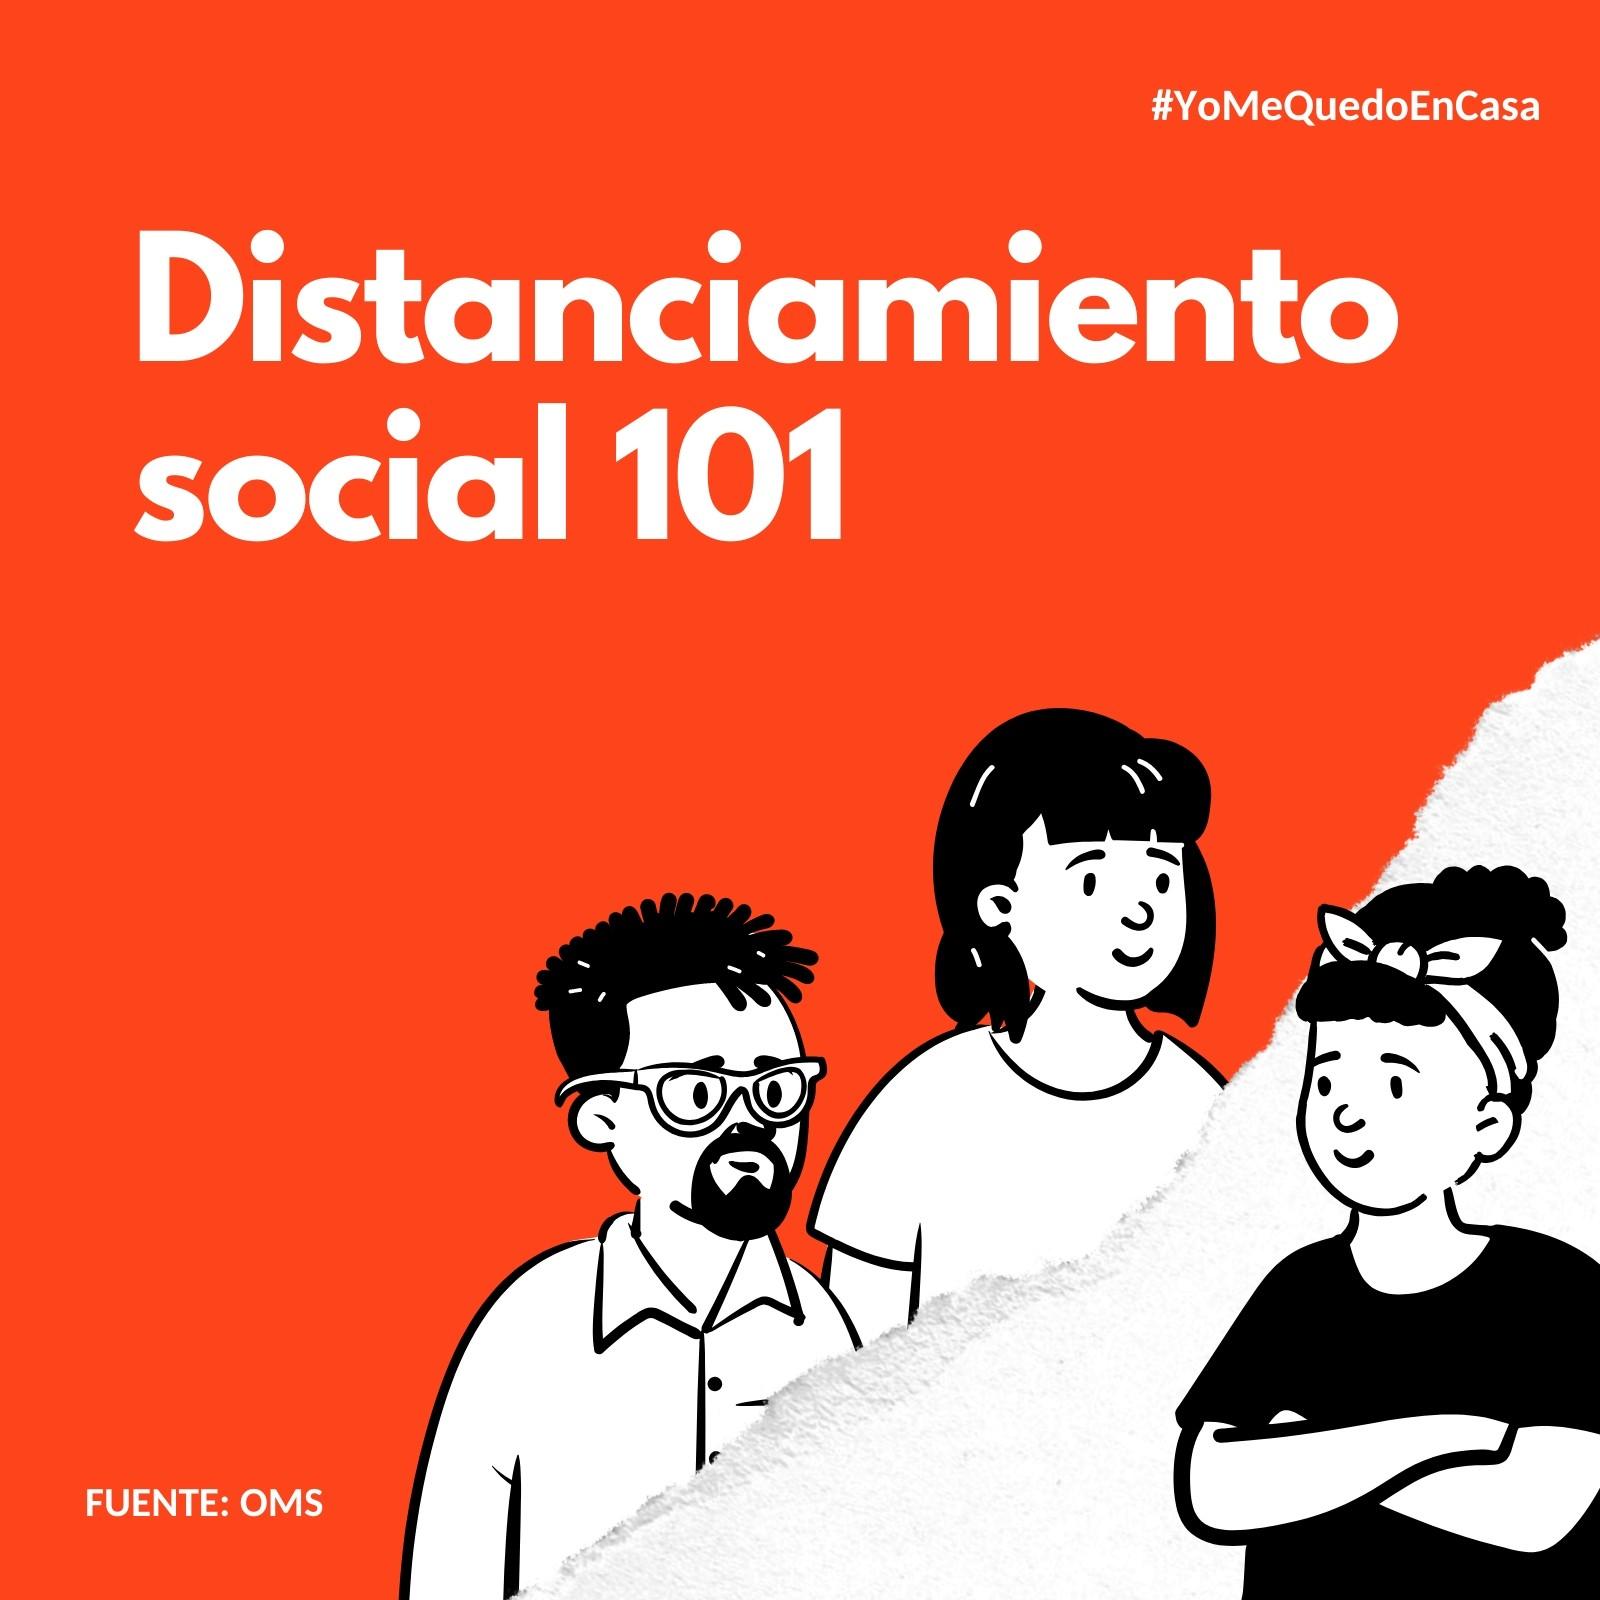 Distanciamiento social coronavirus con fondo naranja Post para Instagram